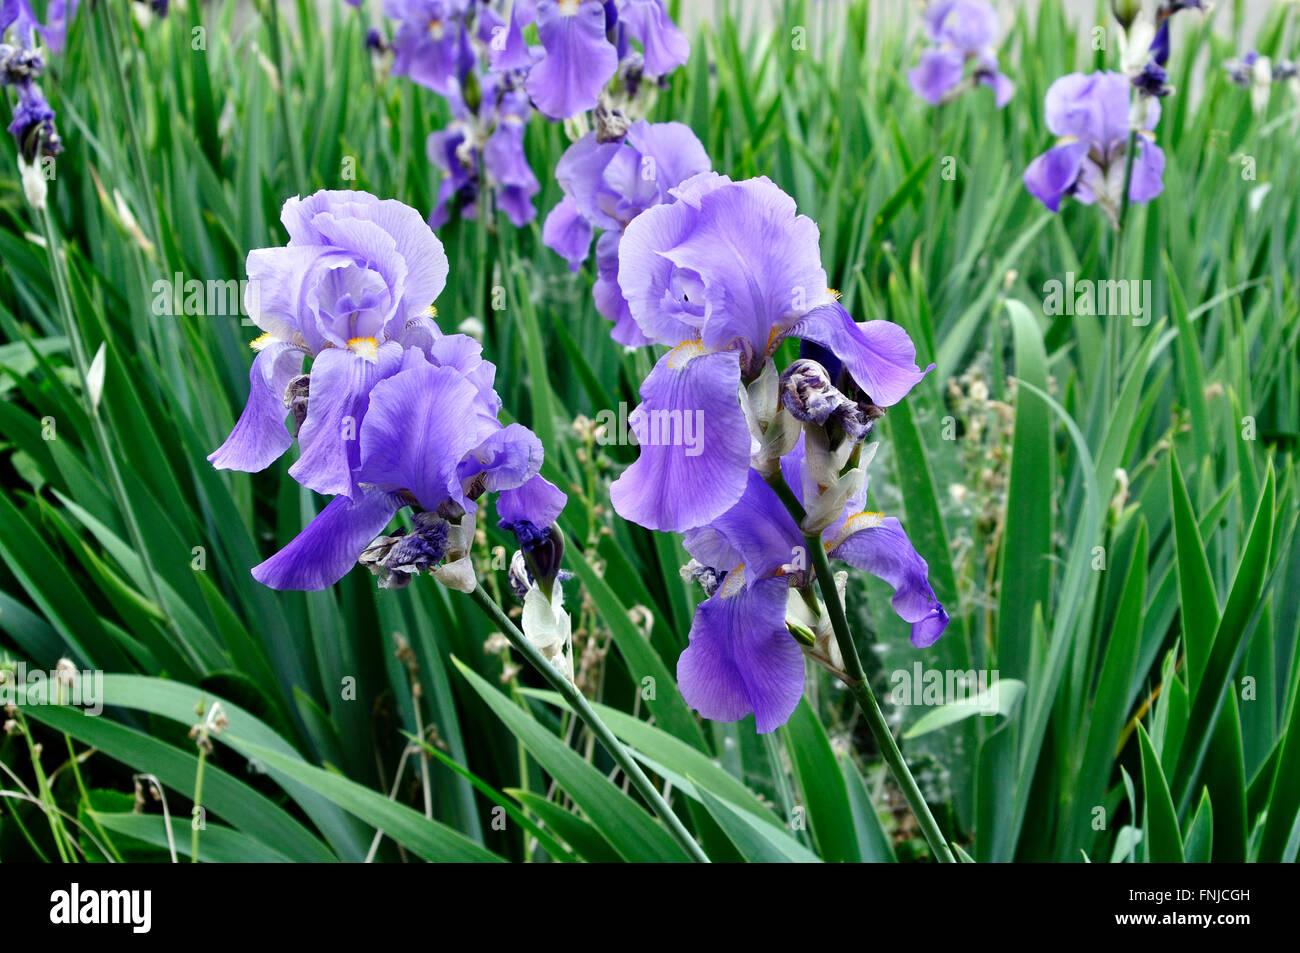 Iris flower garden stock photos iris flower garden stock images italy lombardy garden iris flower stock image izmirmasajfo